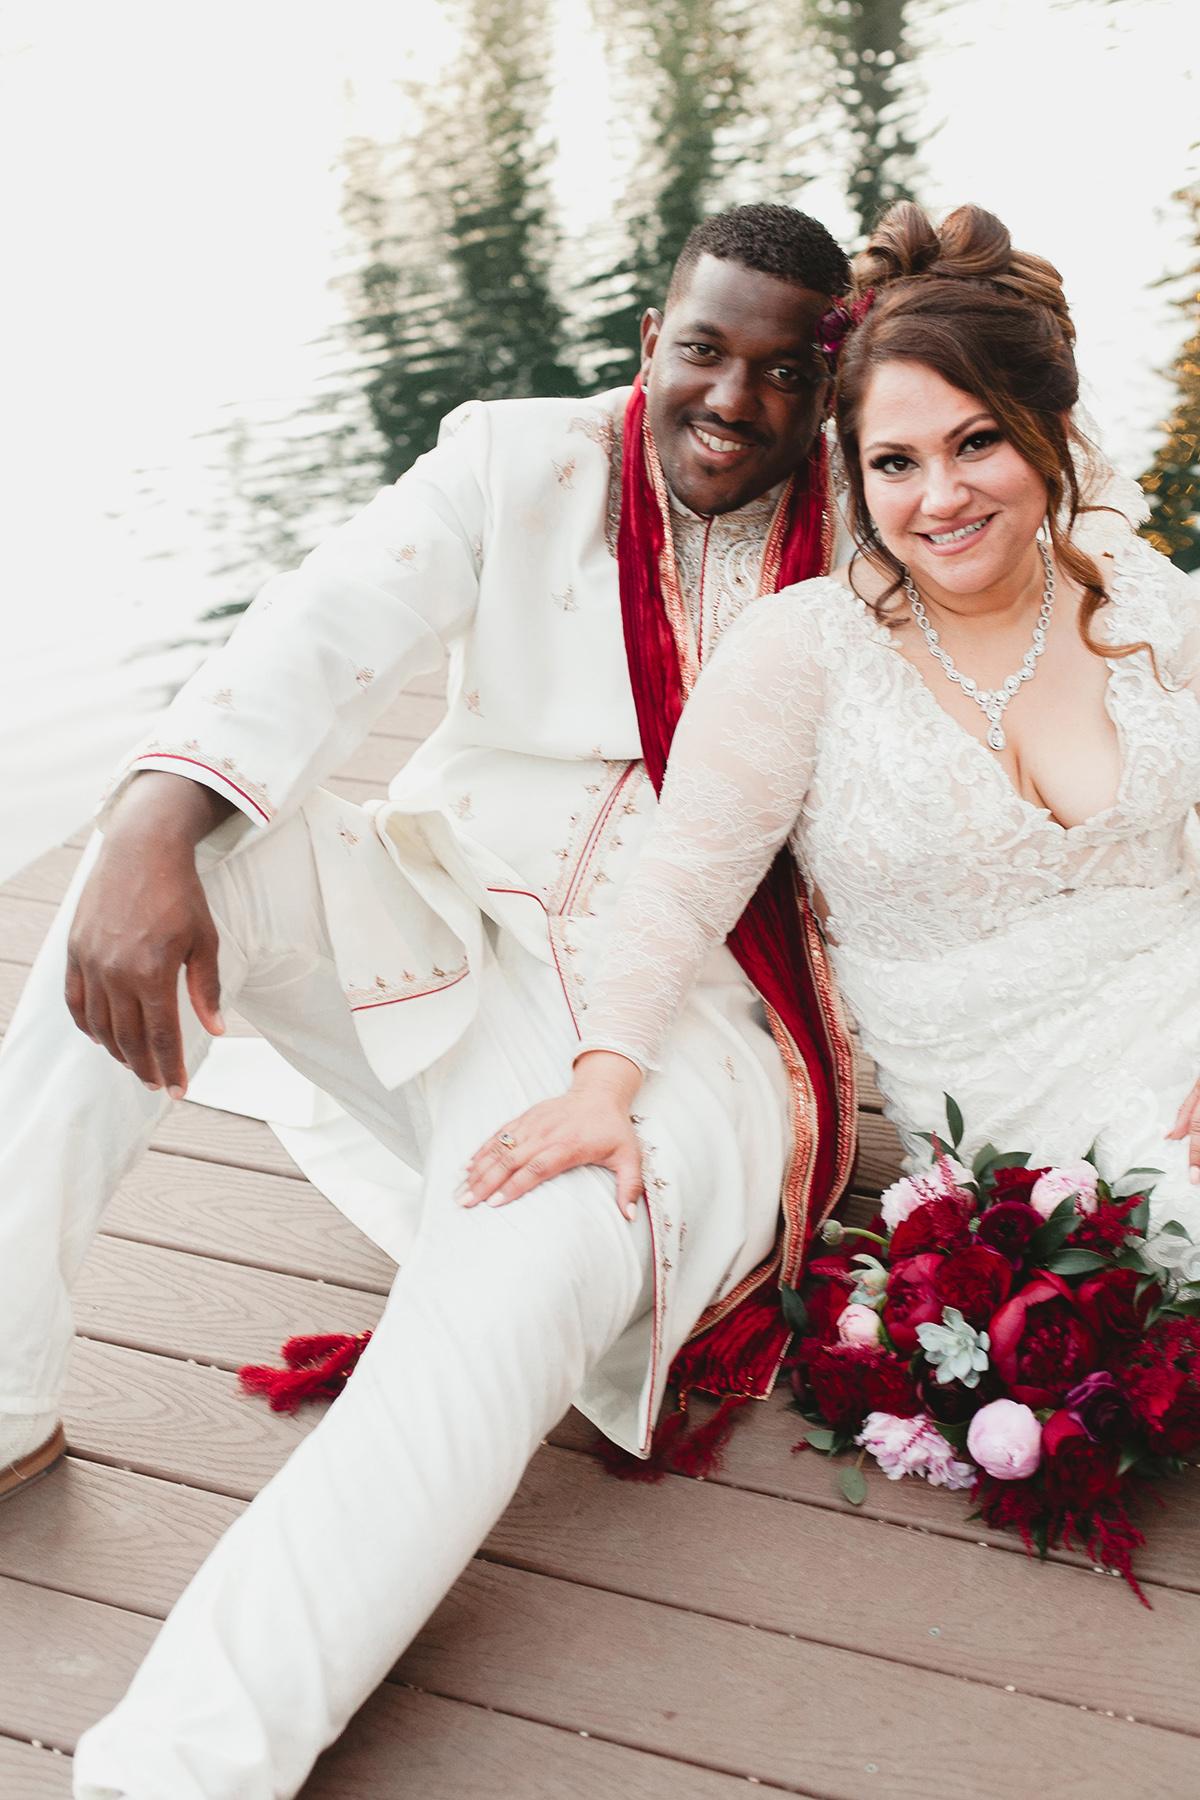 jas_theo_lakeoak_meadows_wedding_-077a.jpg